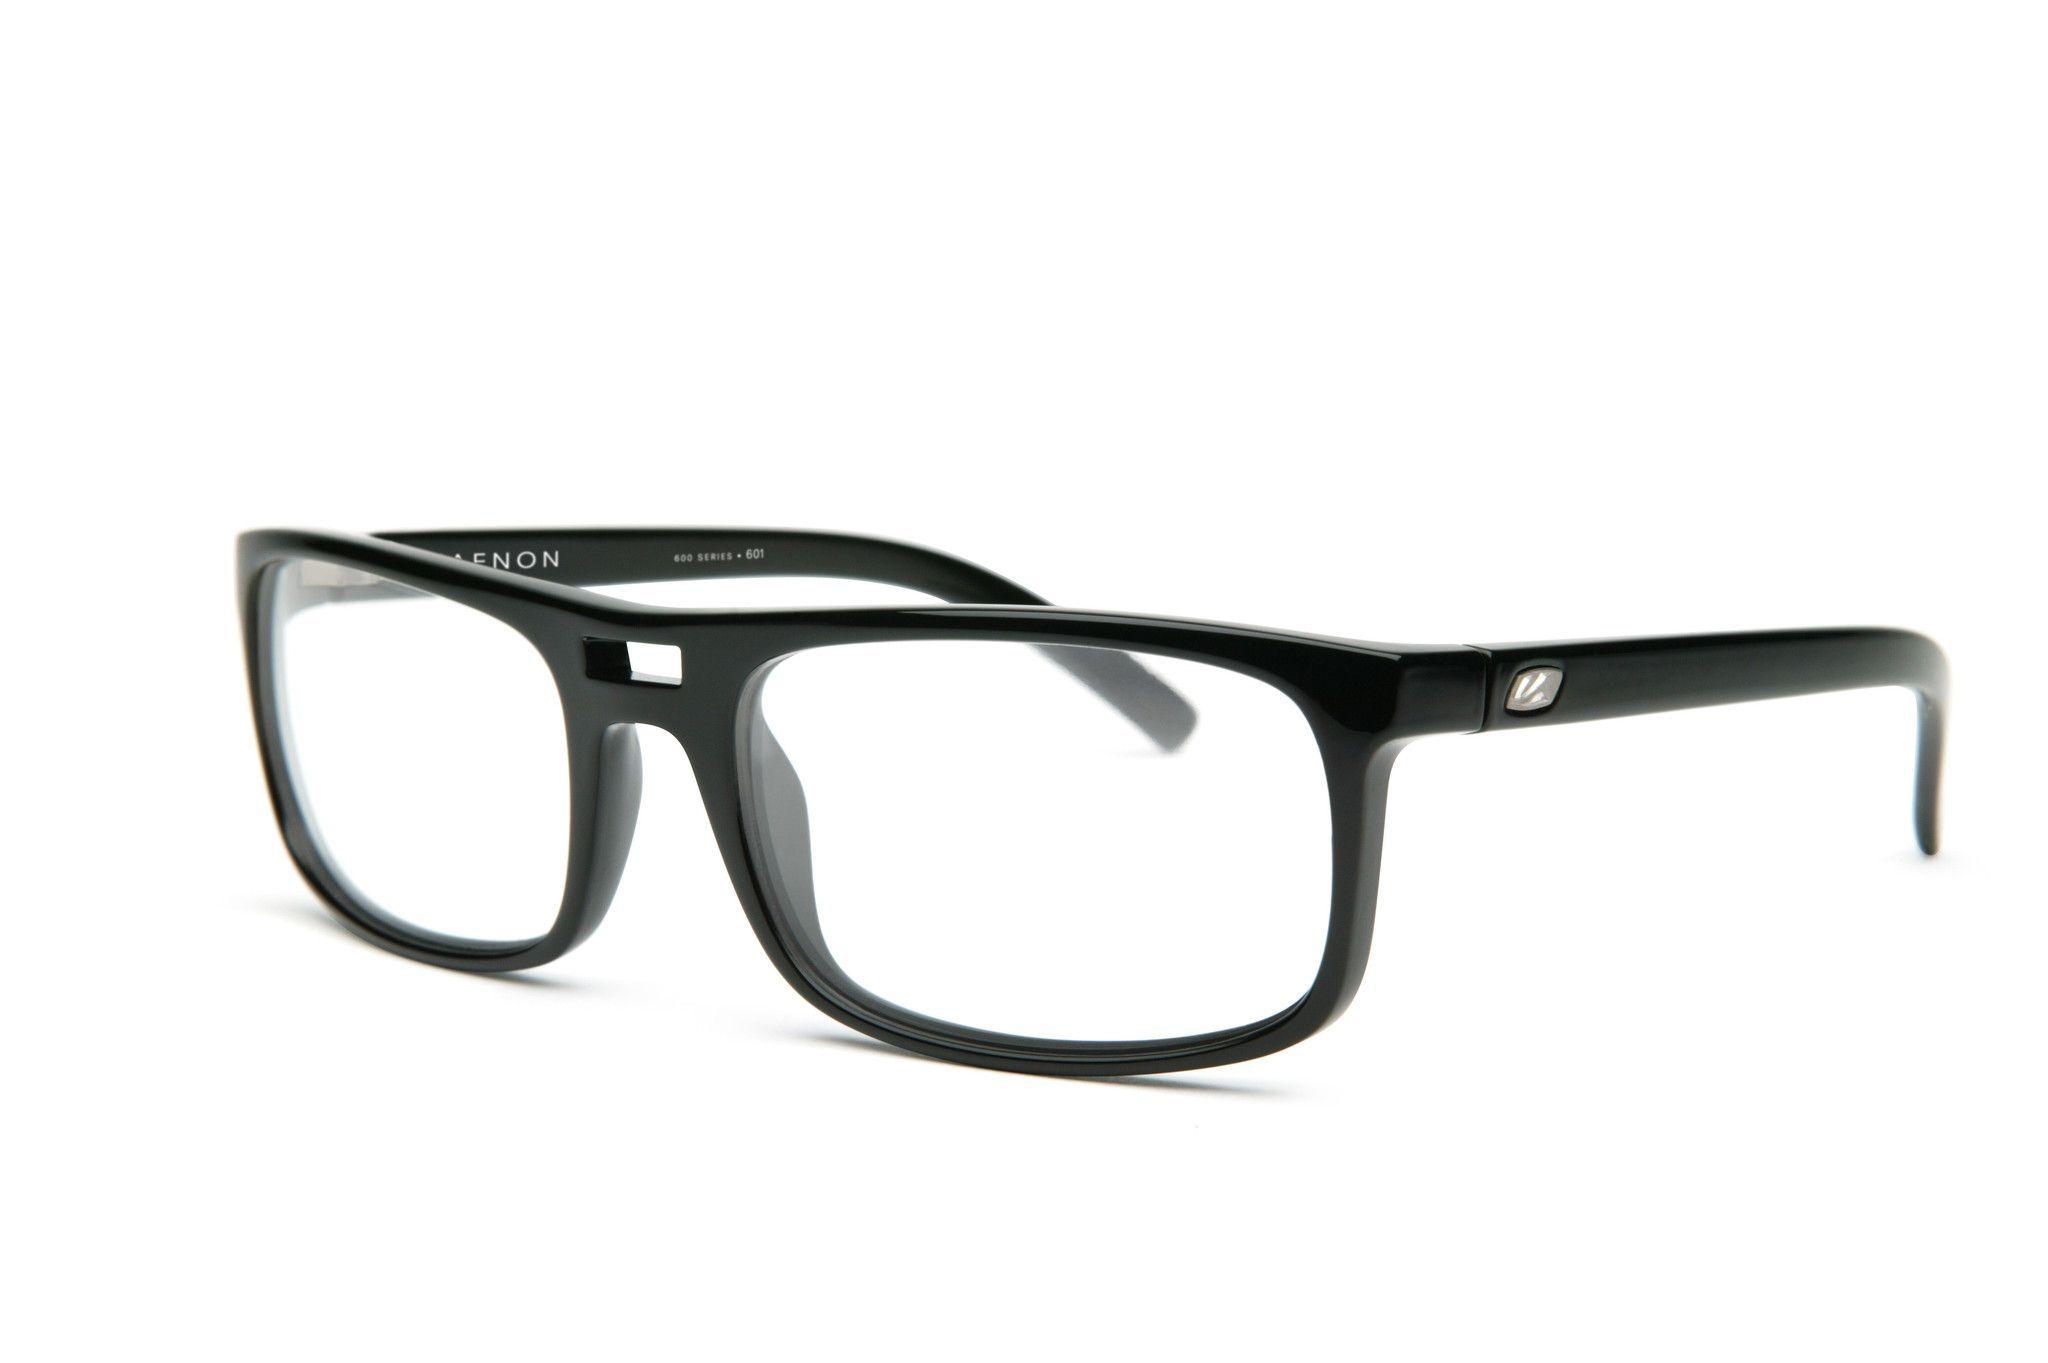 30 best glasses style images on Pinterest